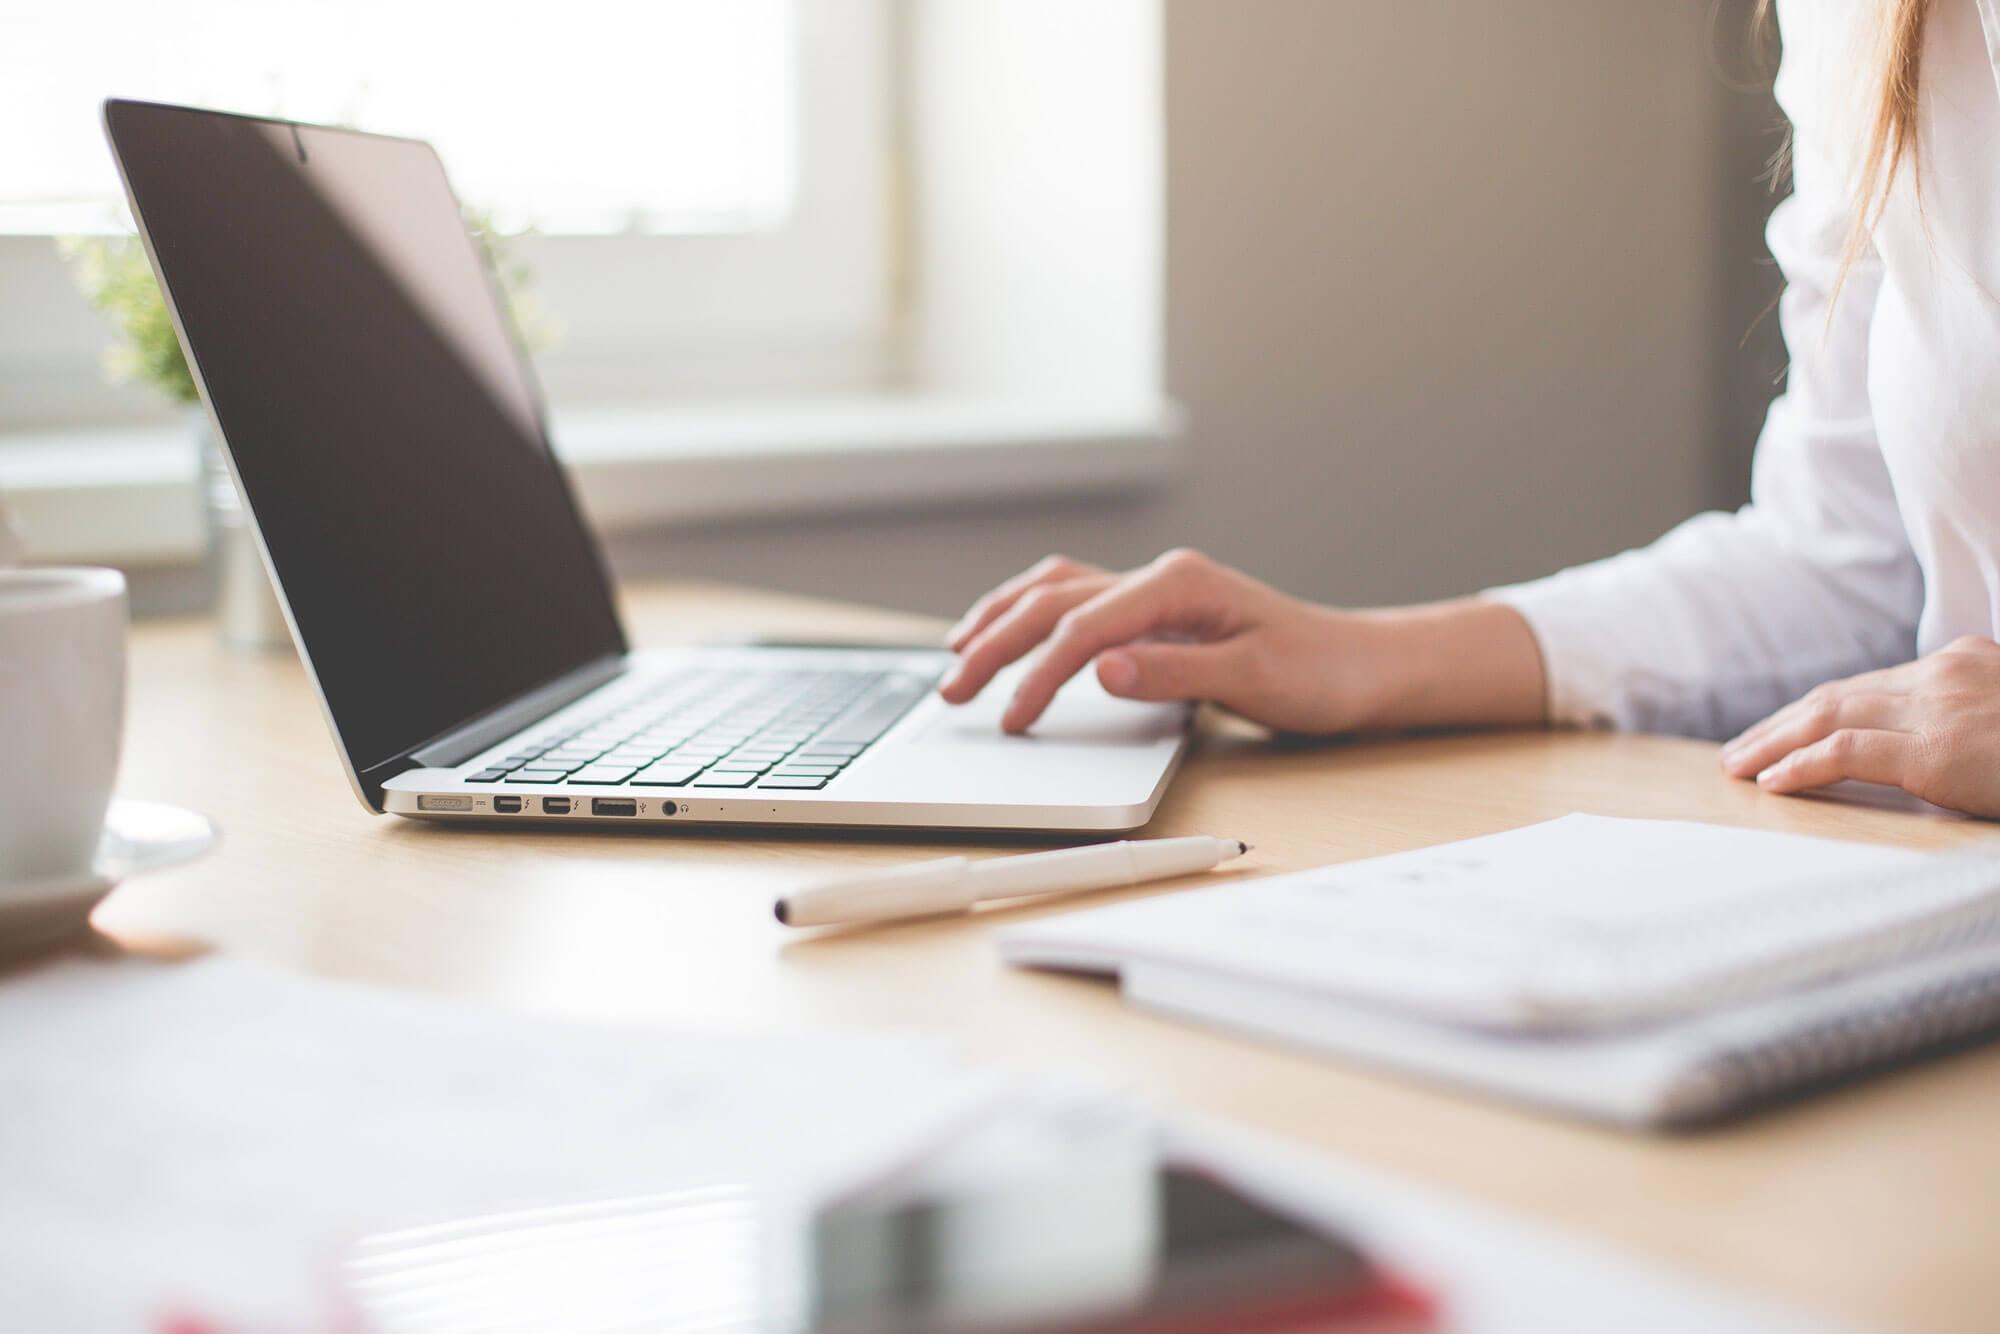 Bewerbung am Laptop schreiben